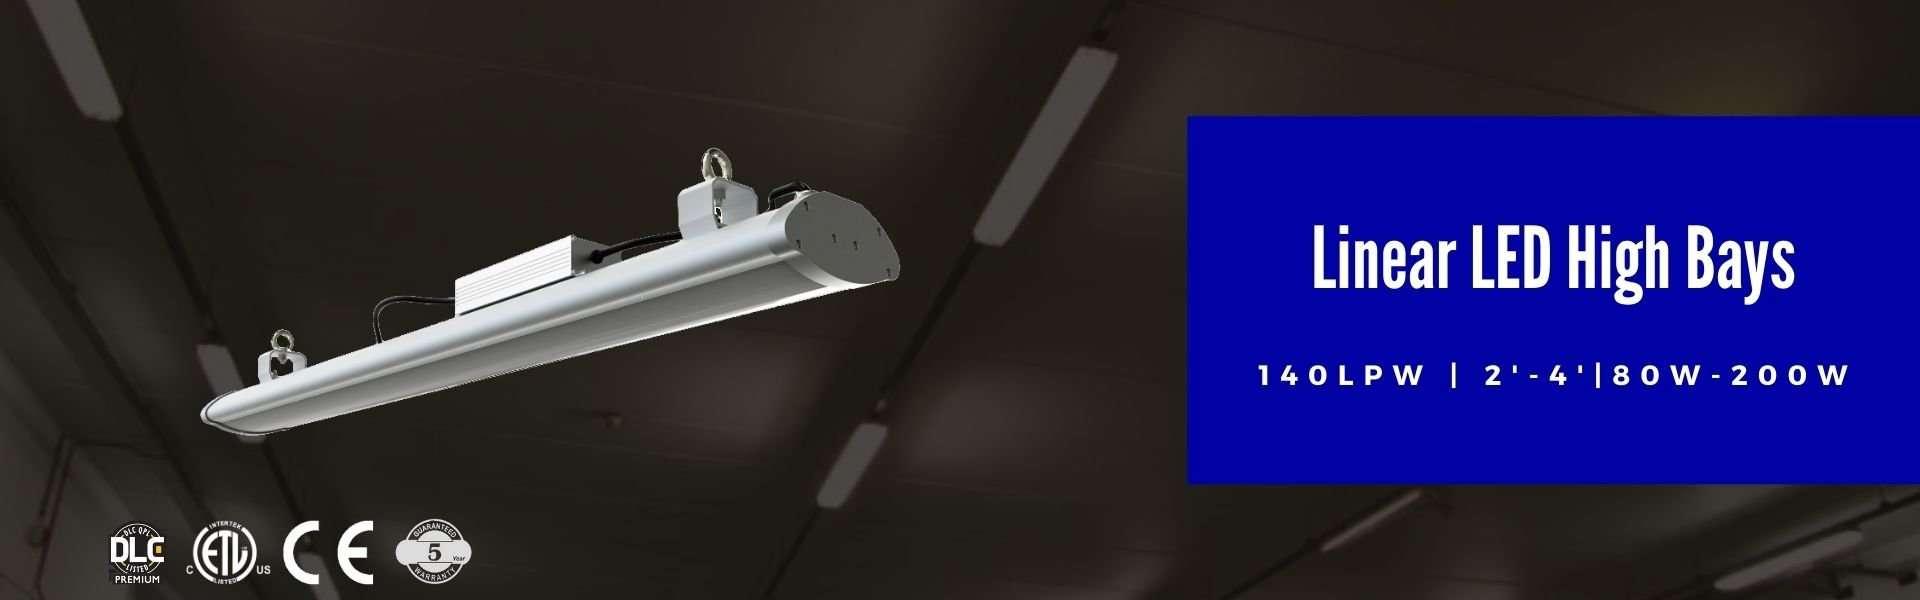 Lightide DLC QPL linear led High Bays Lighting